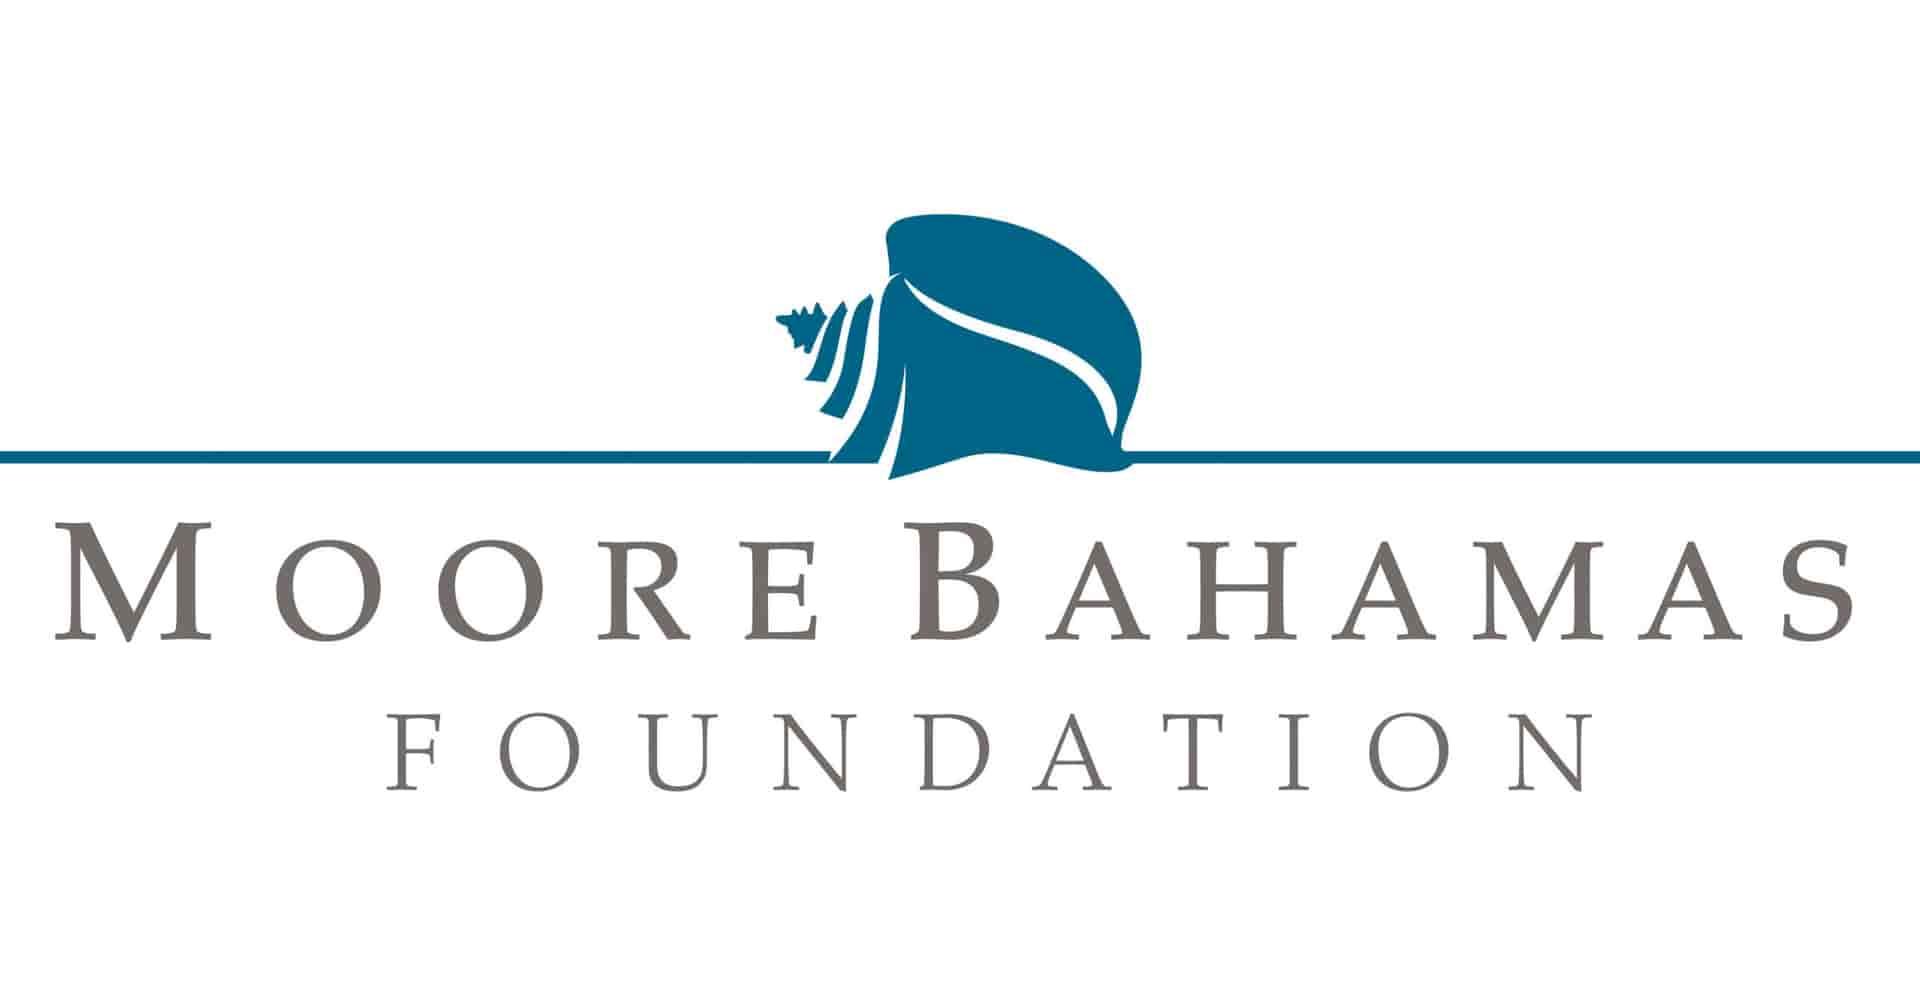 The Moore Bahamas Foundation Logo